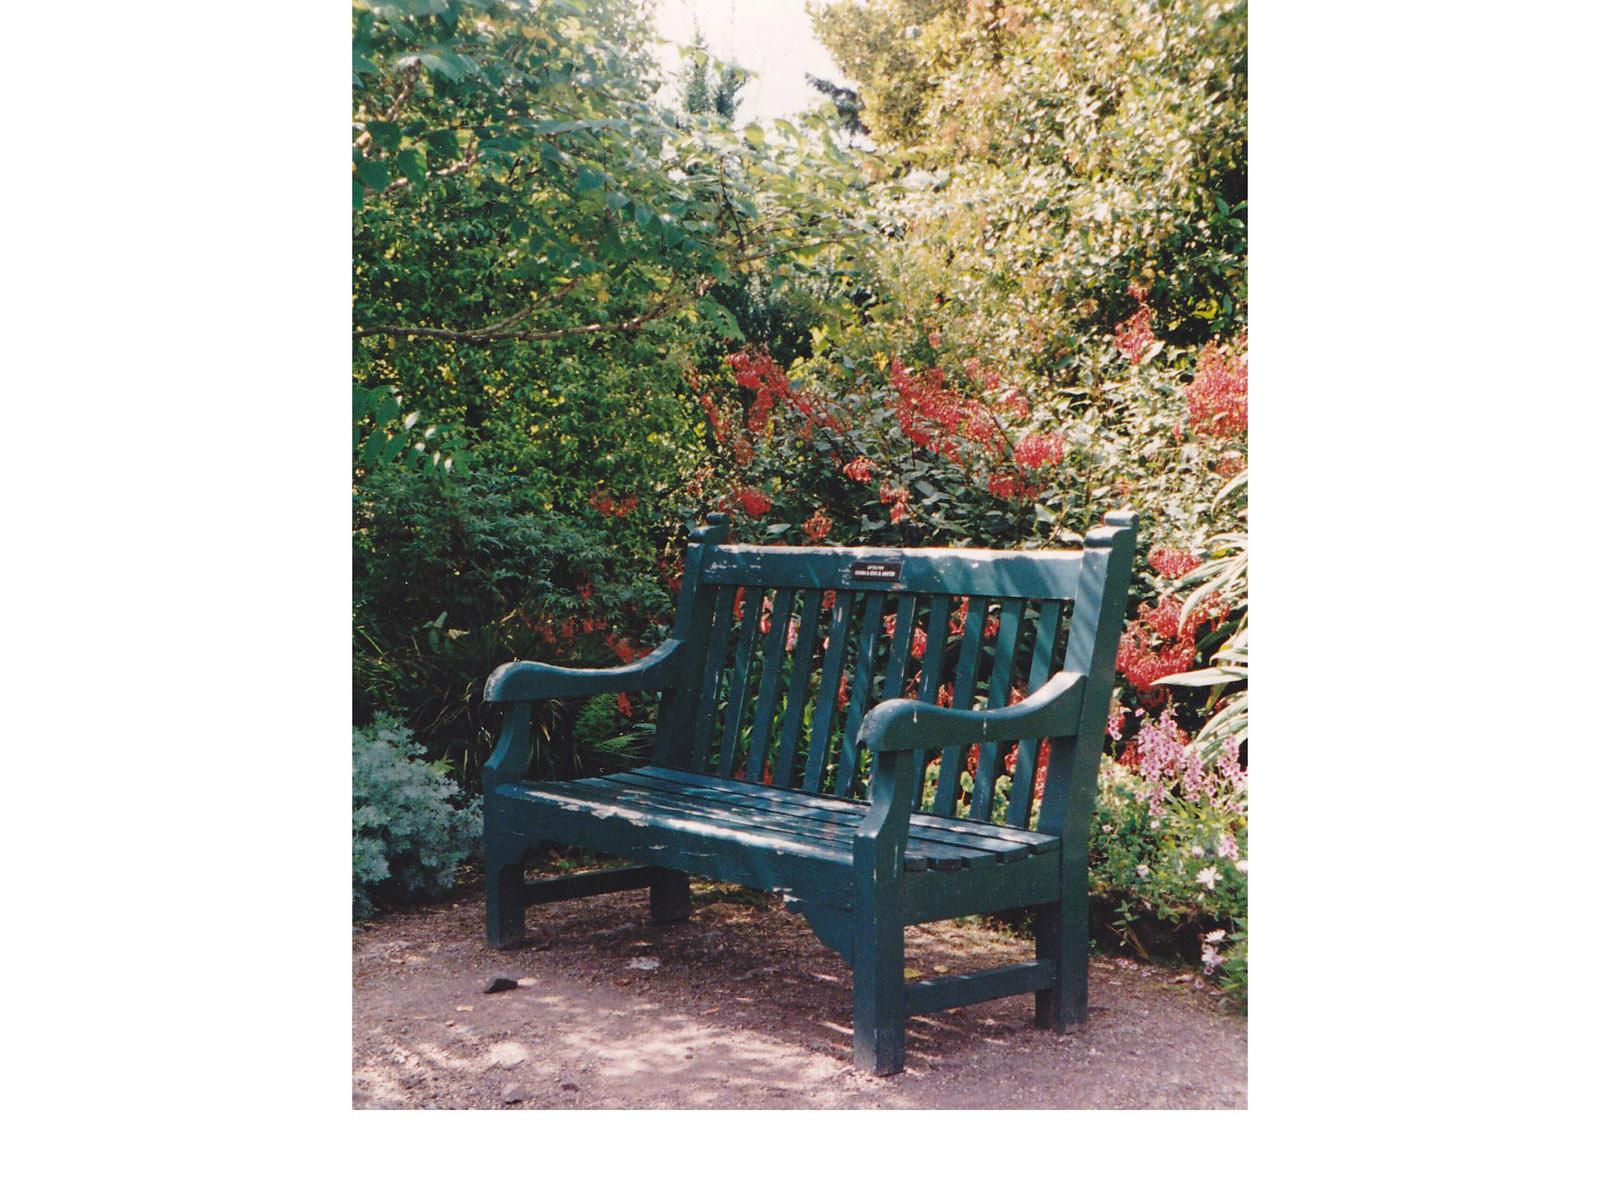 Cat-1a-007-tuinenpark